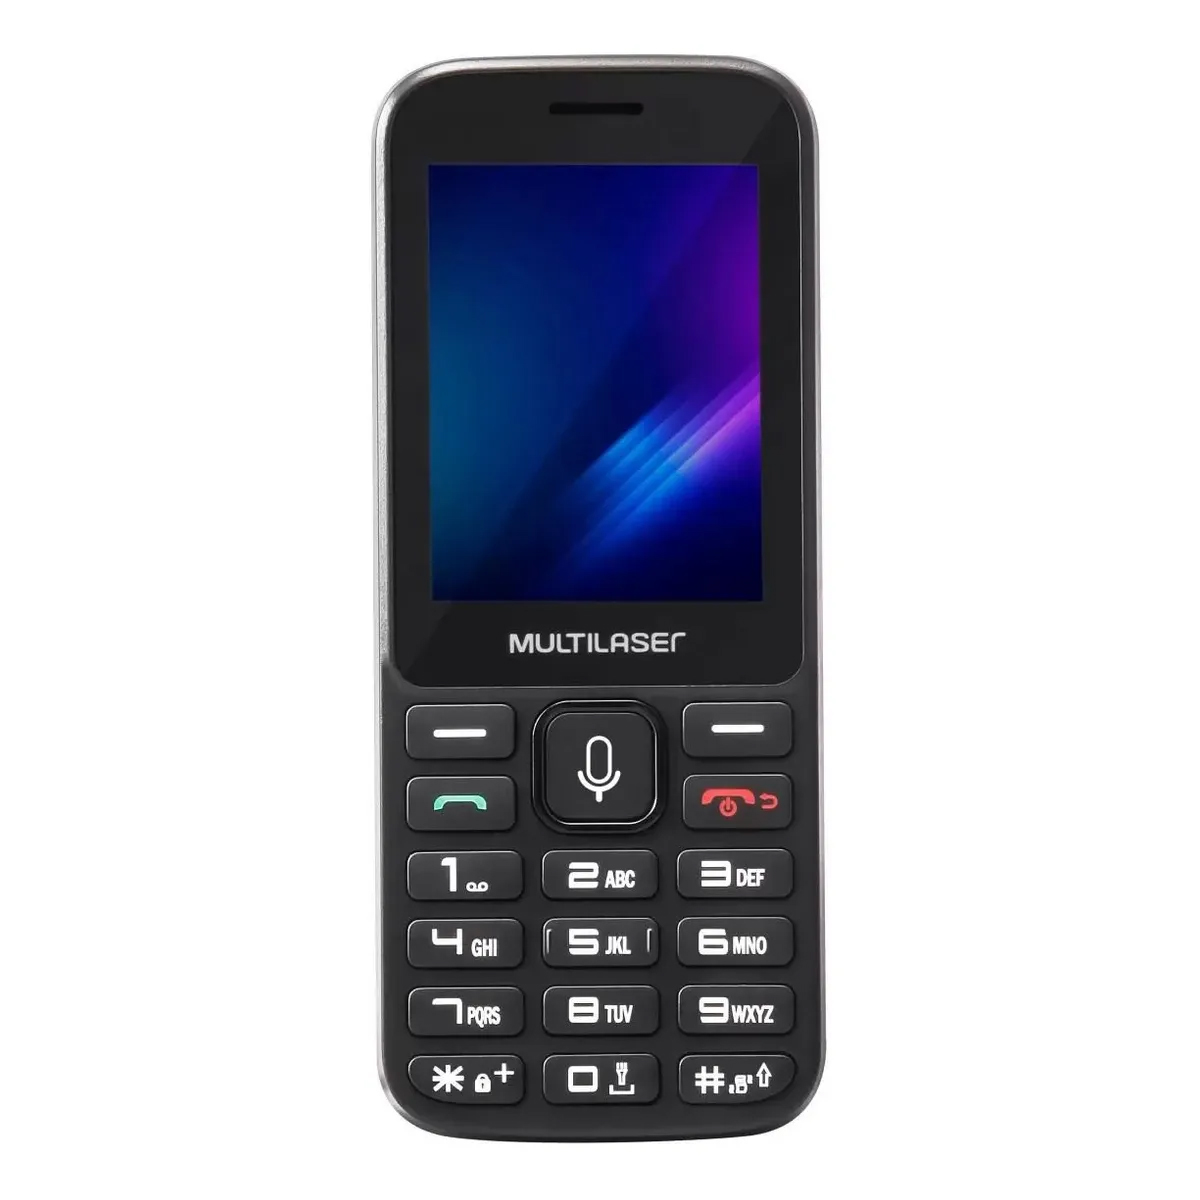 Multilaser Zapp 3g Whatsapp P9098 Preto Novo